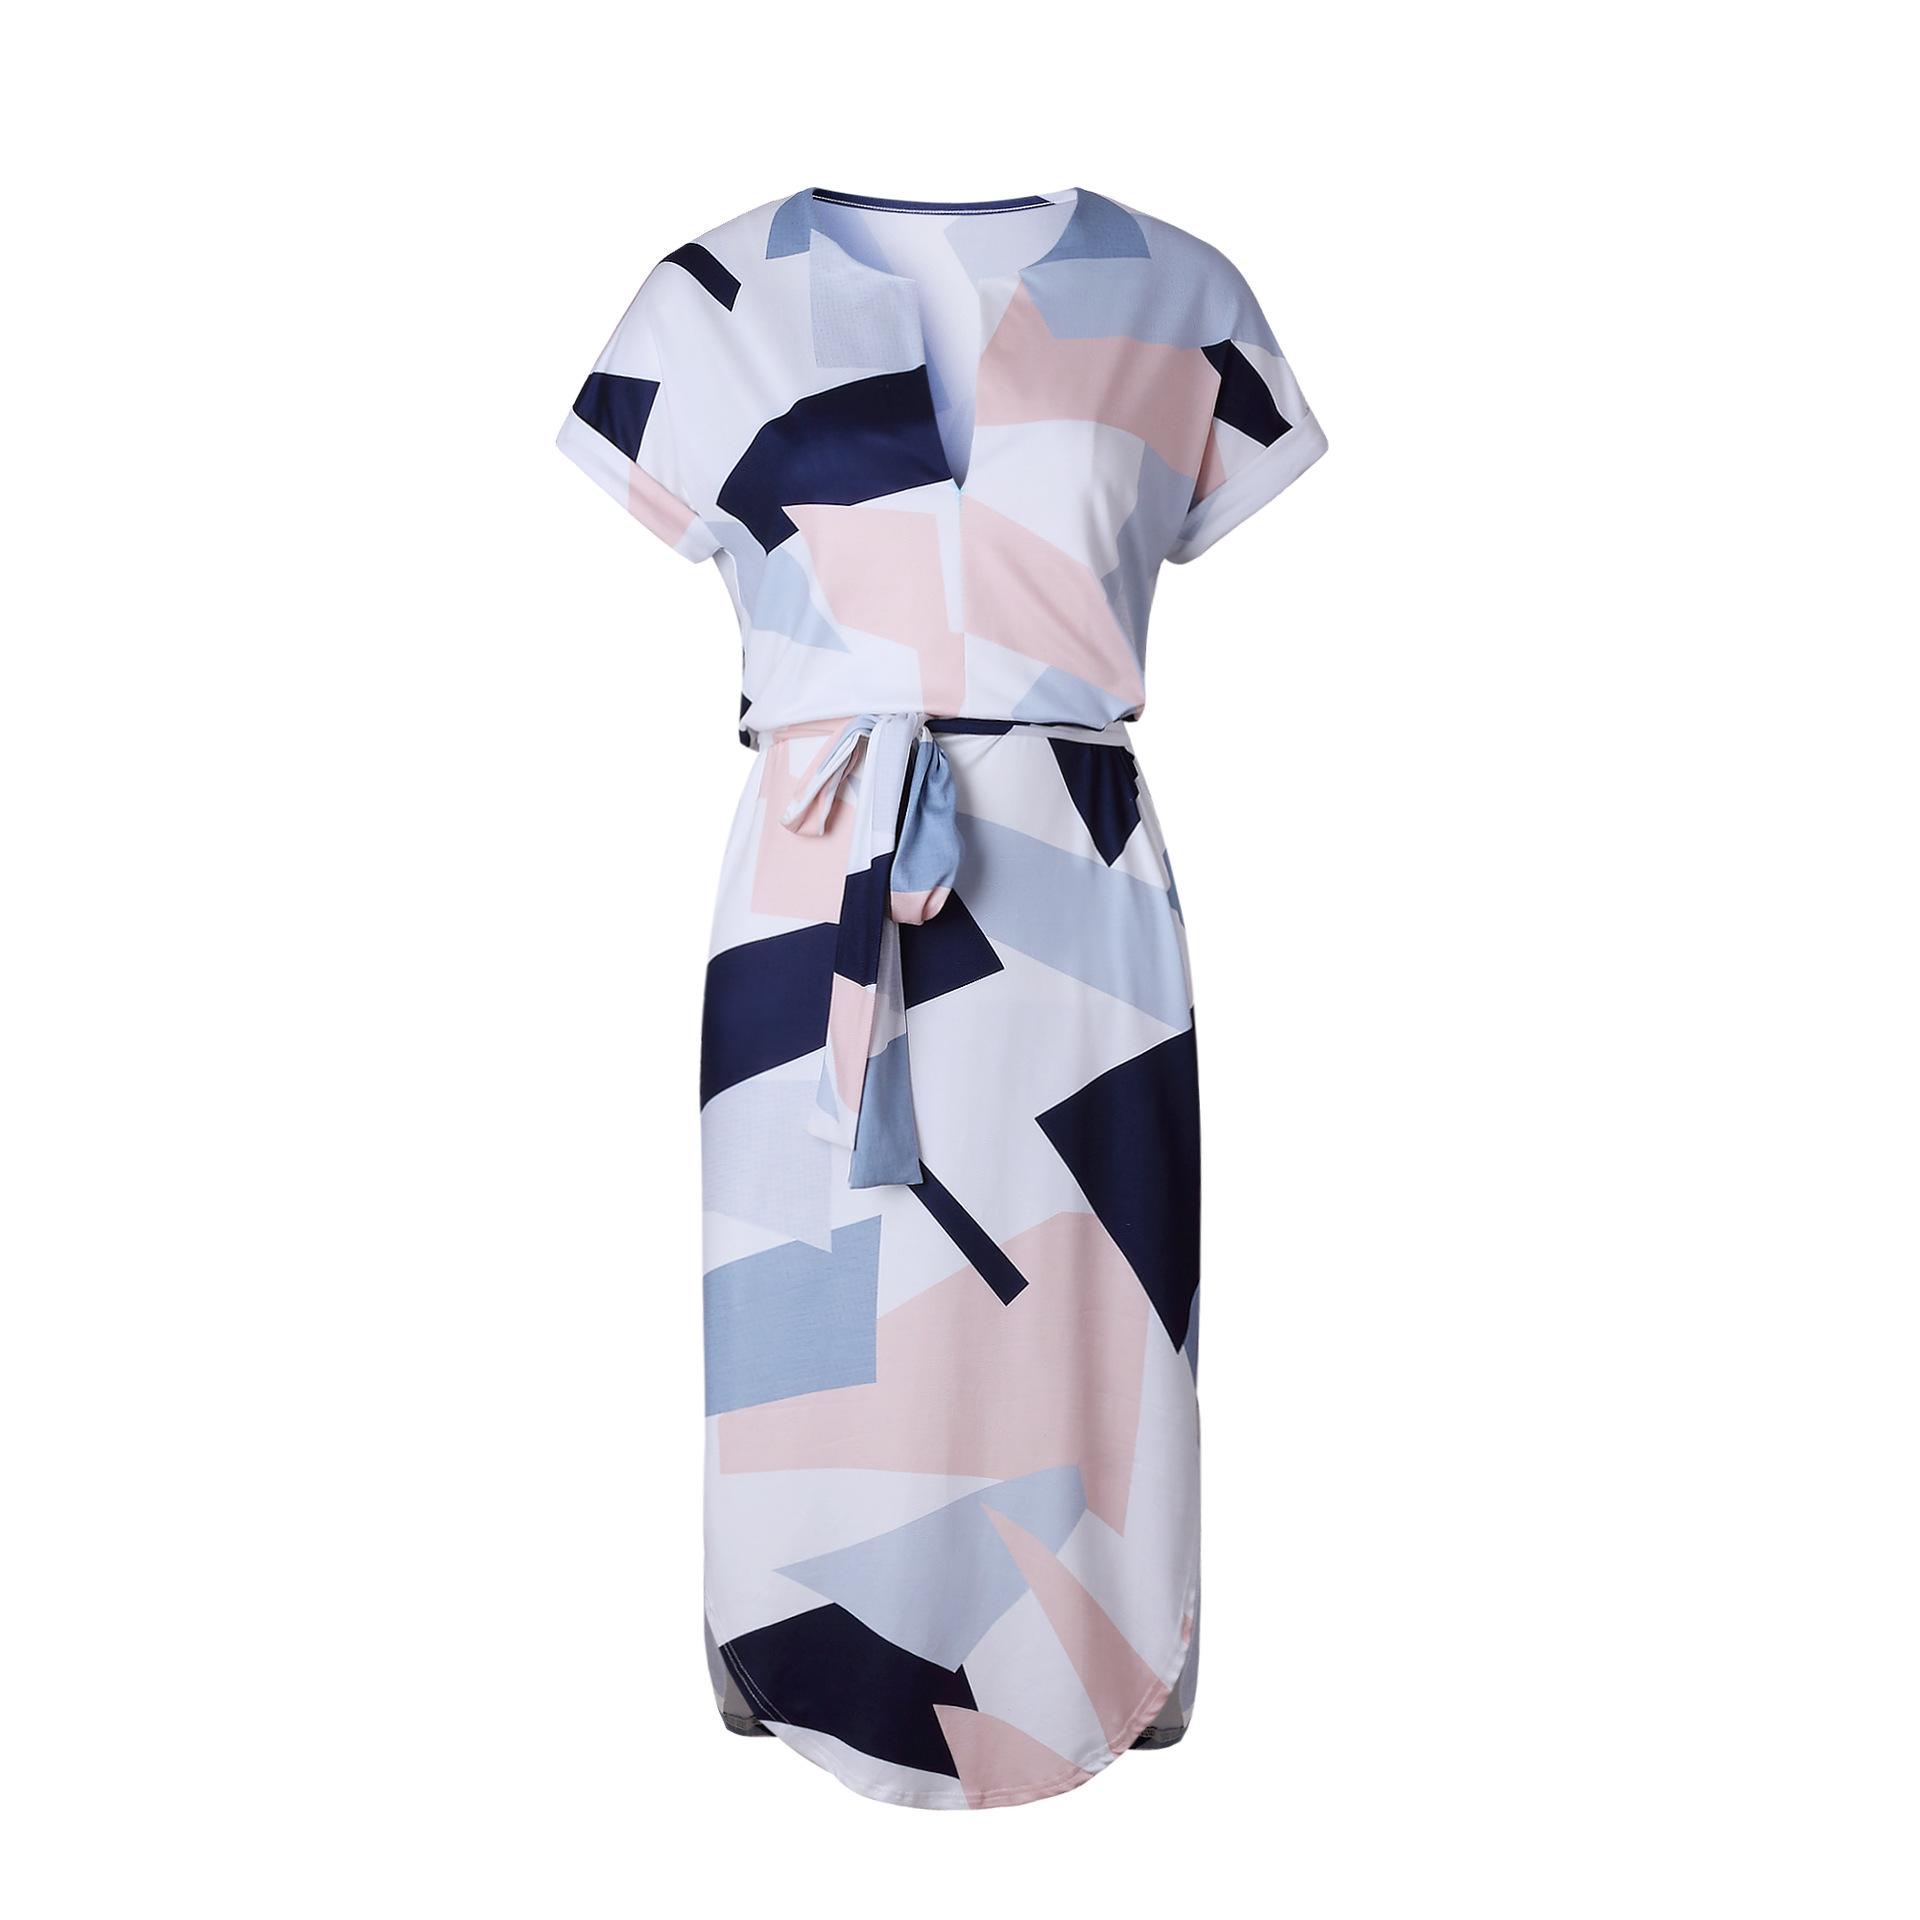 2018 Summer Dress Women Print V Neck Short Sleeve Robe Female Dresses Casual Sashes Midi Dress Ladies Elegant Vestidos Dropship 42